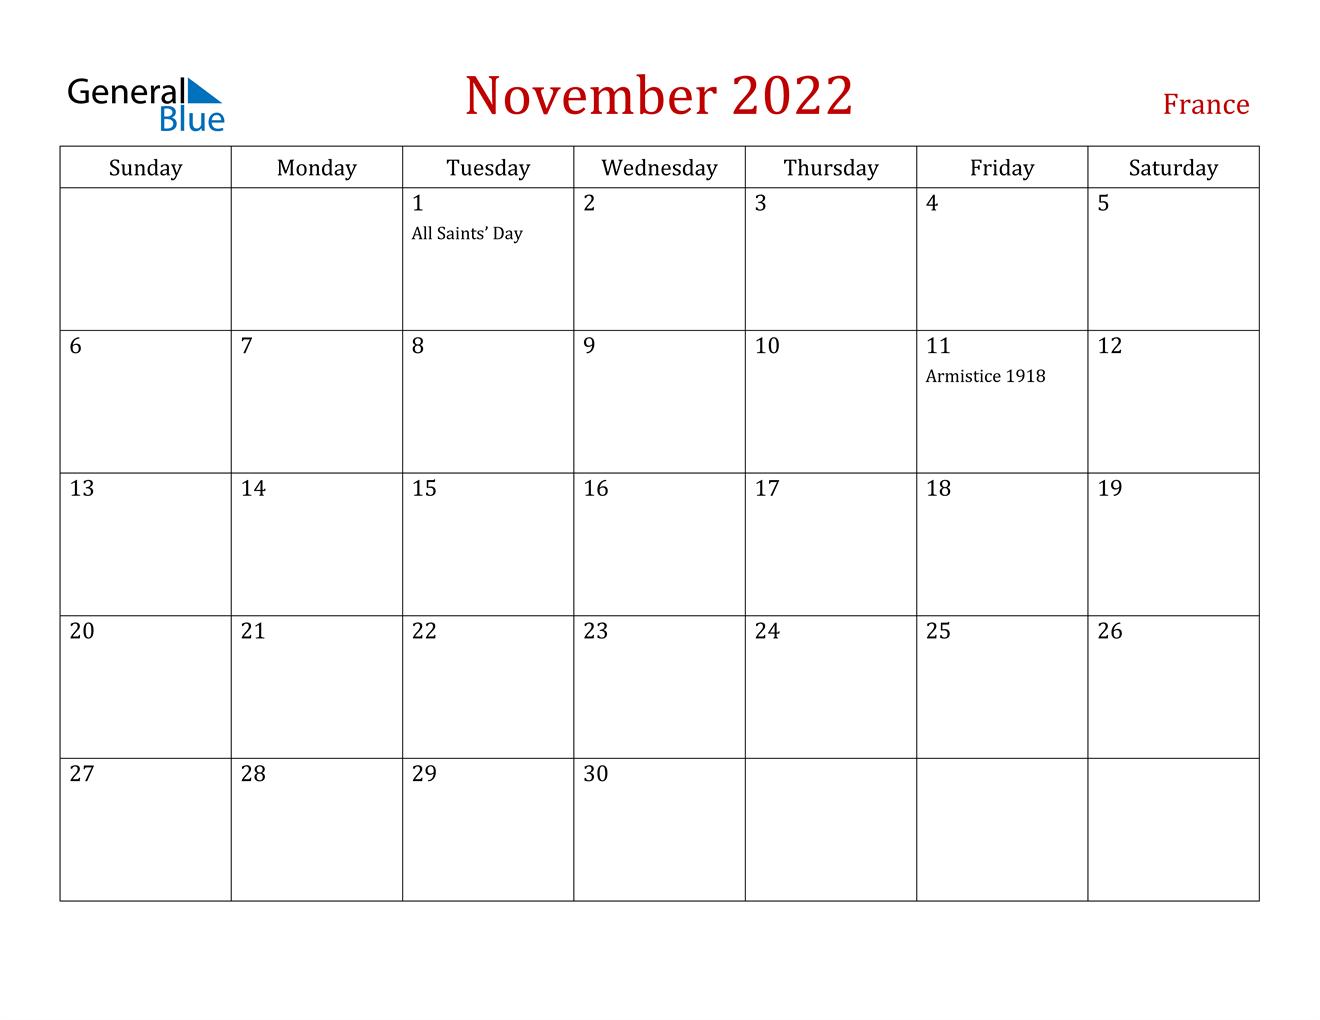 November 2022 Calendar - France